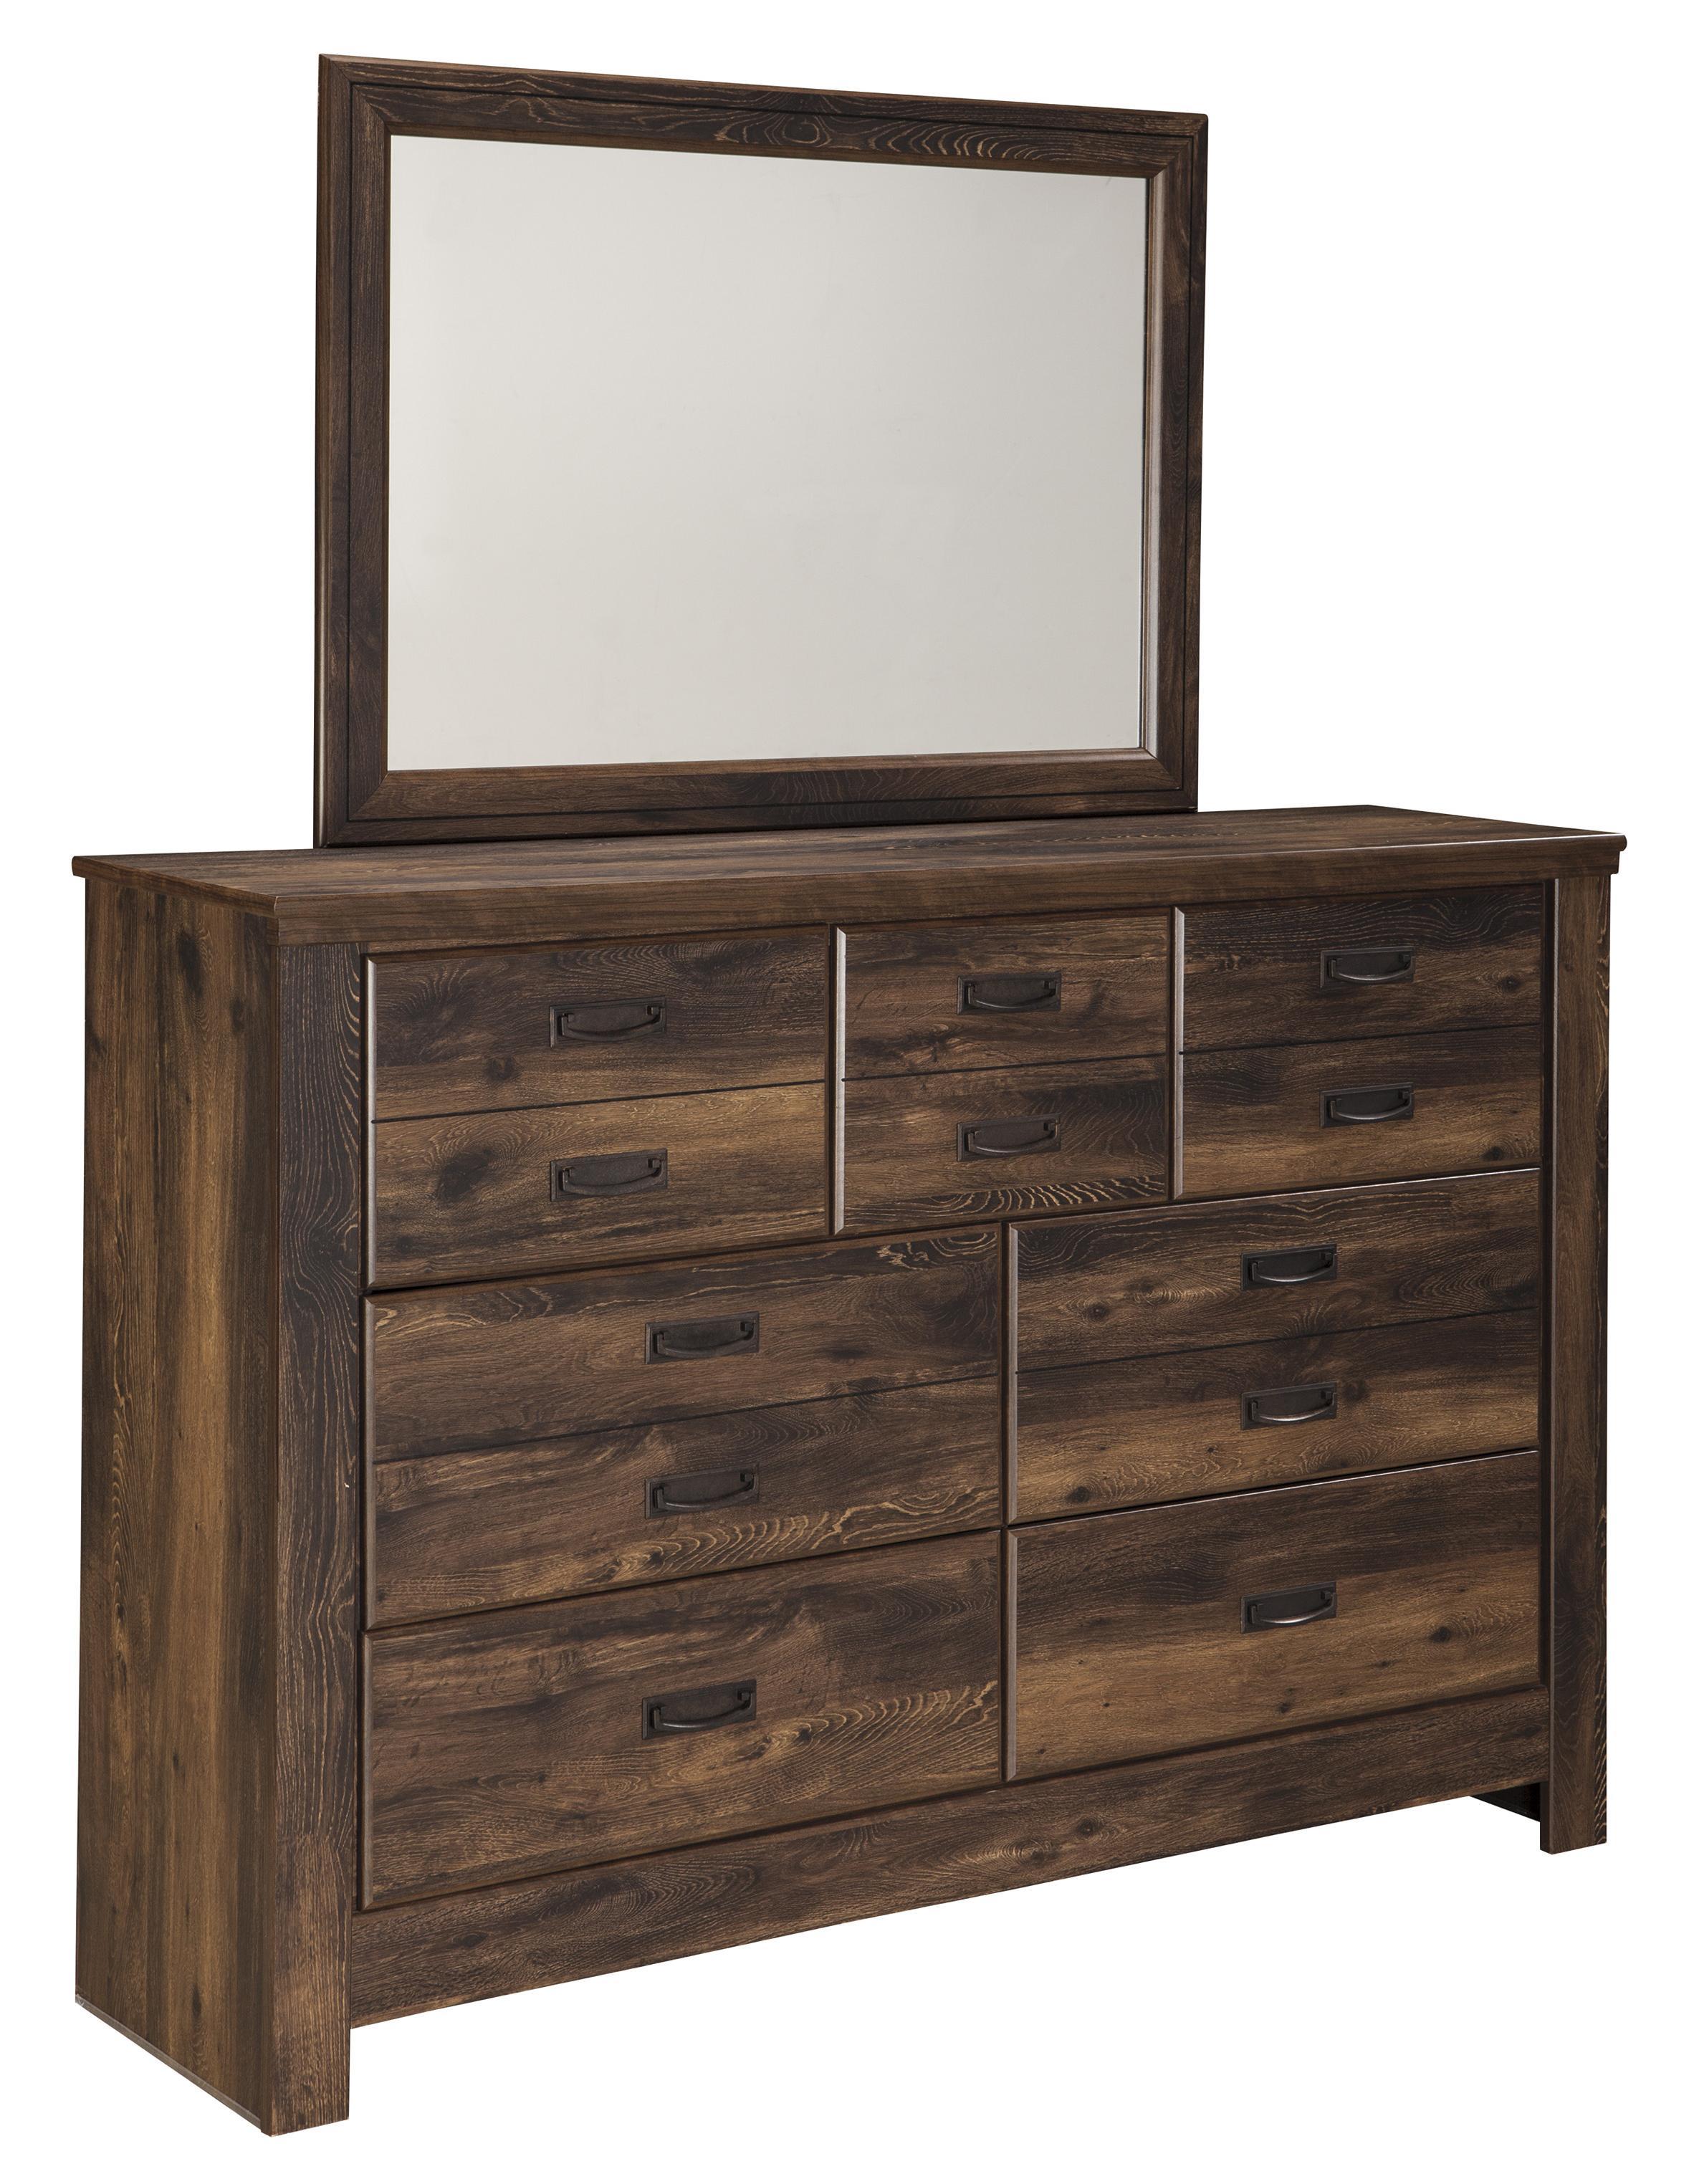 Signature Design by Ashley Quinden Dresser & Mirror - Item Number: B246-31+36